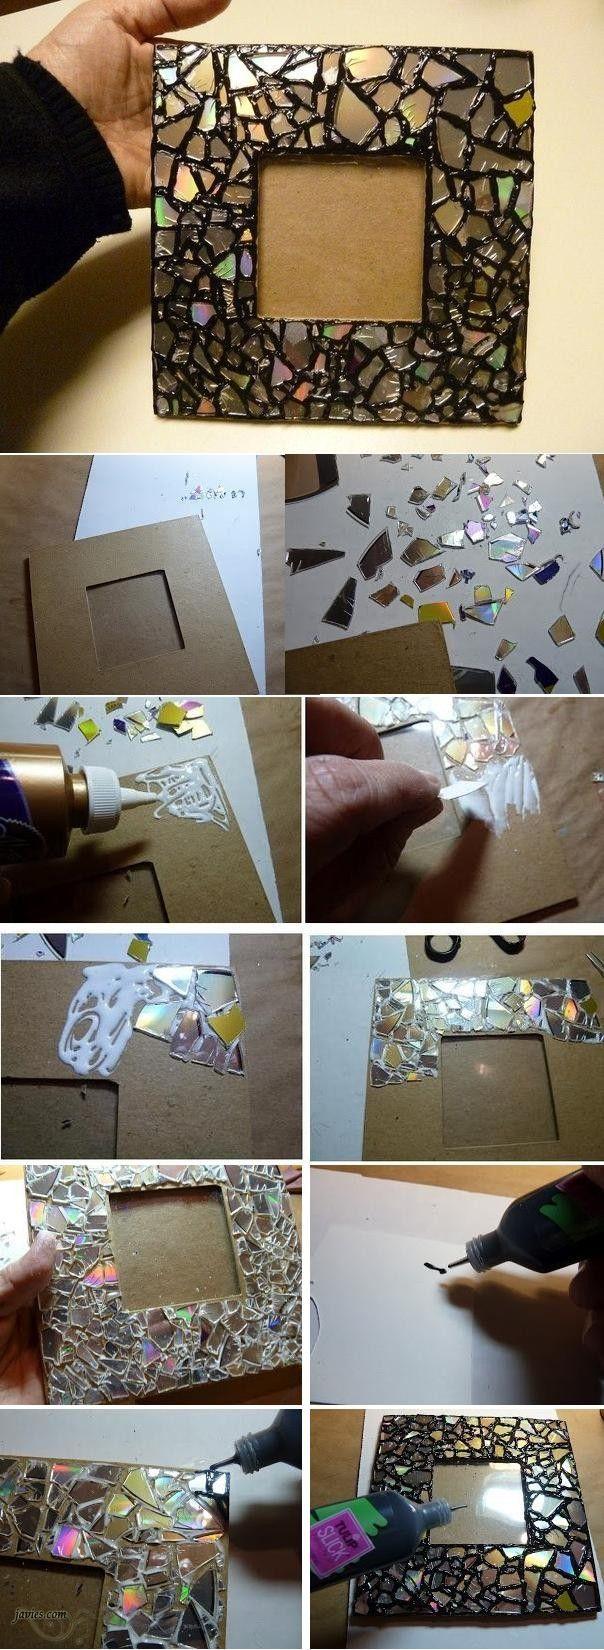 marco-fotos-cd